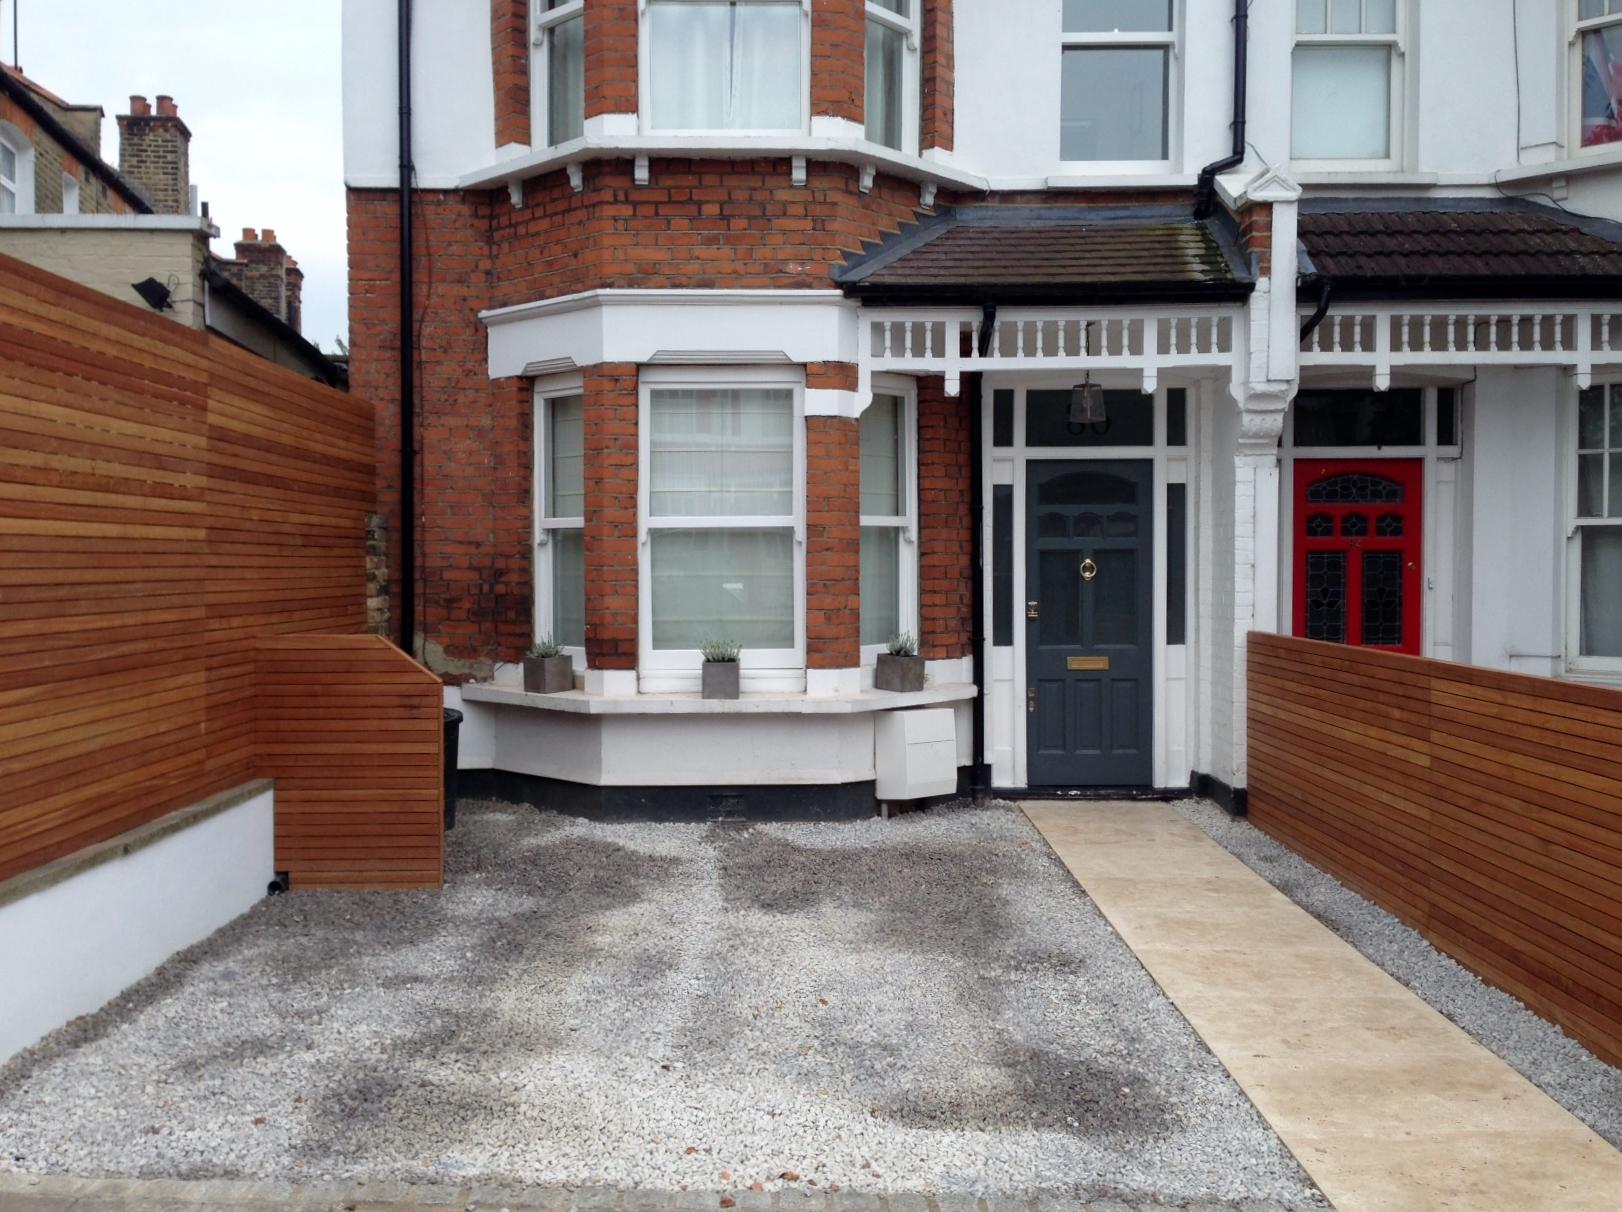 front garden drivewat gravel travertine paving path hardwood privacy screen trellis tooting london (29)